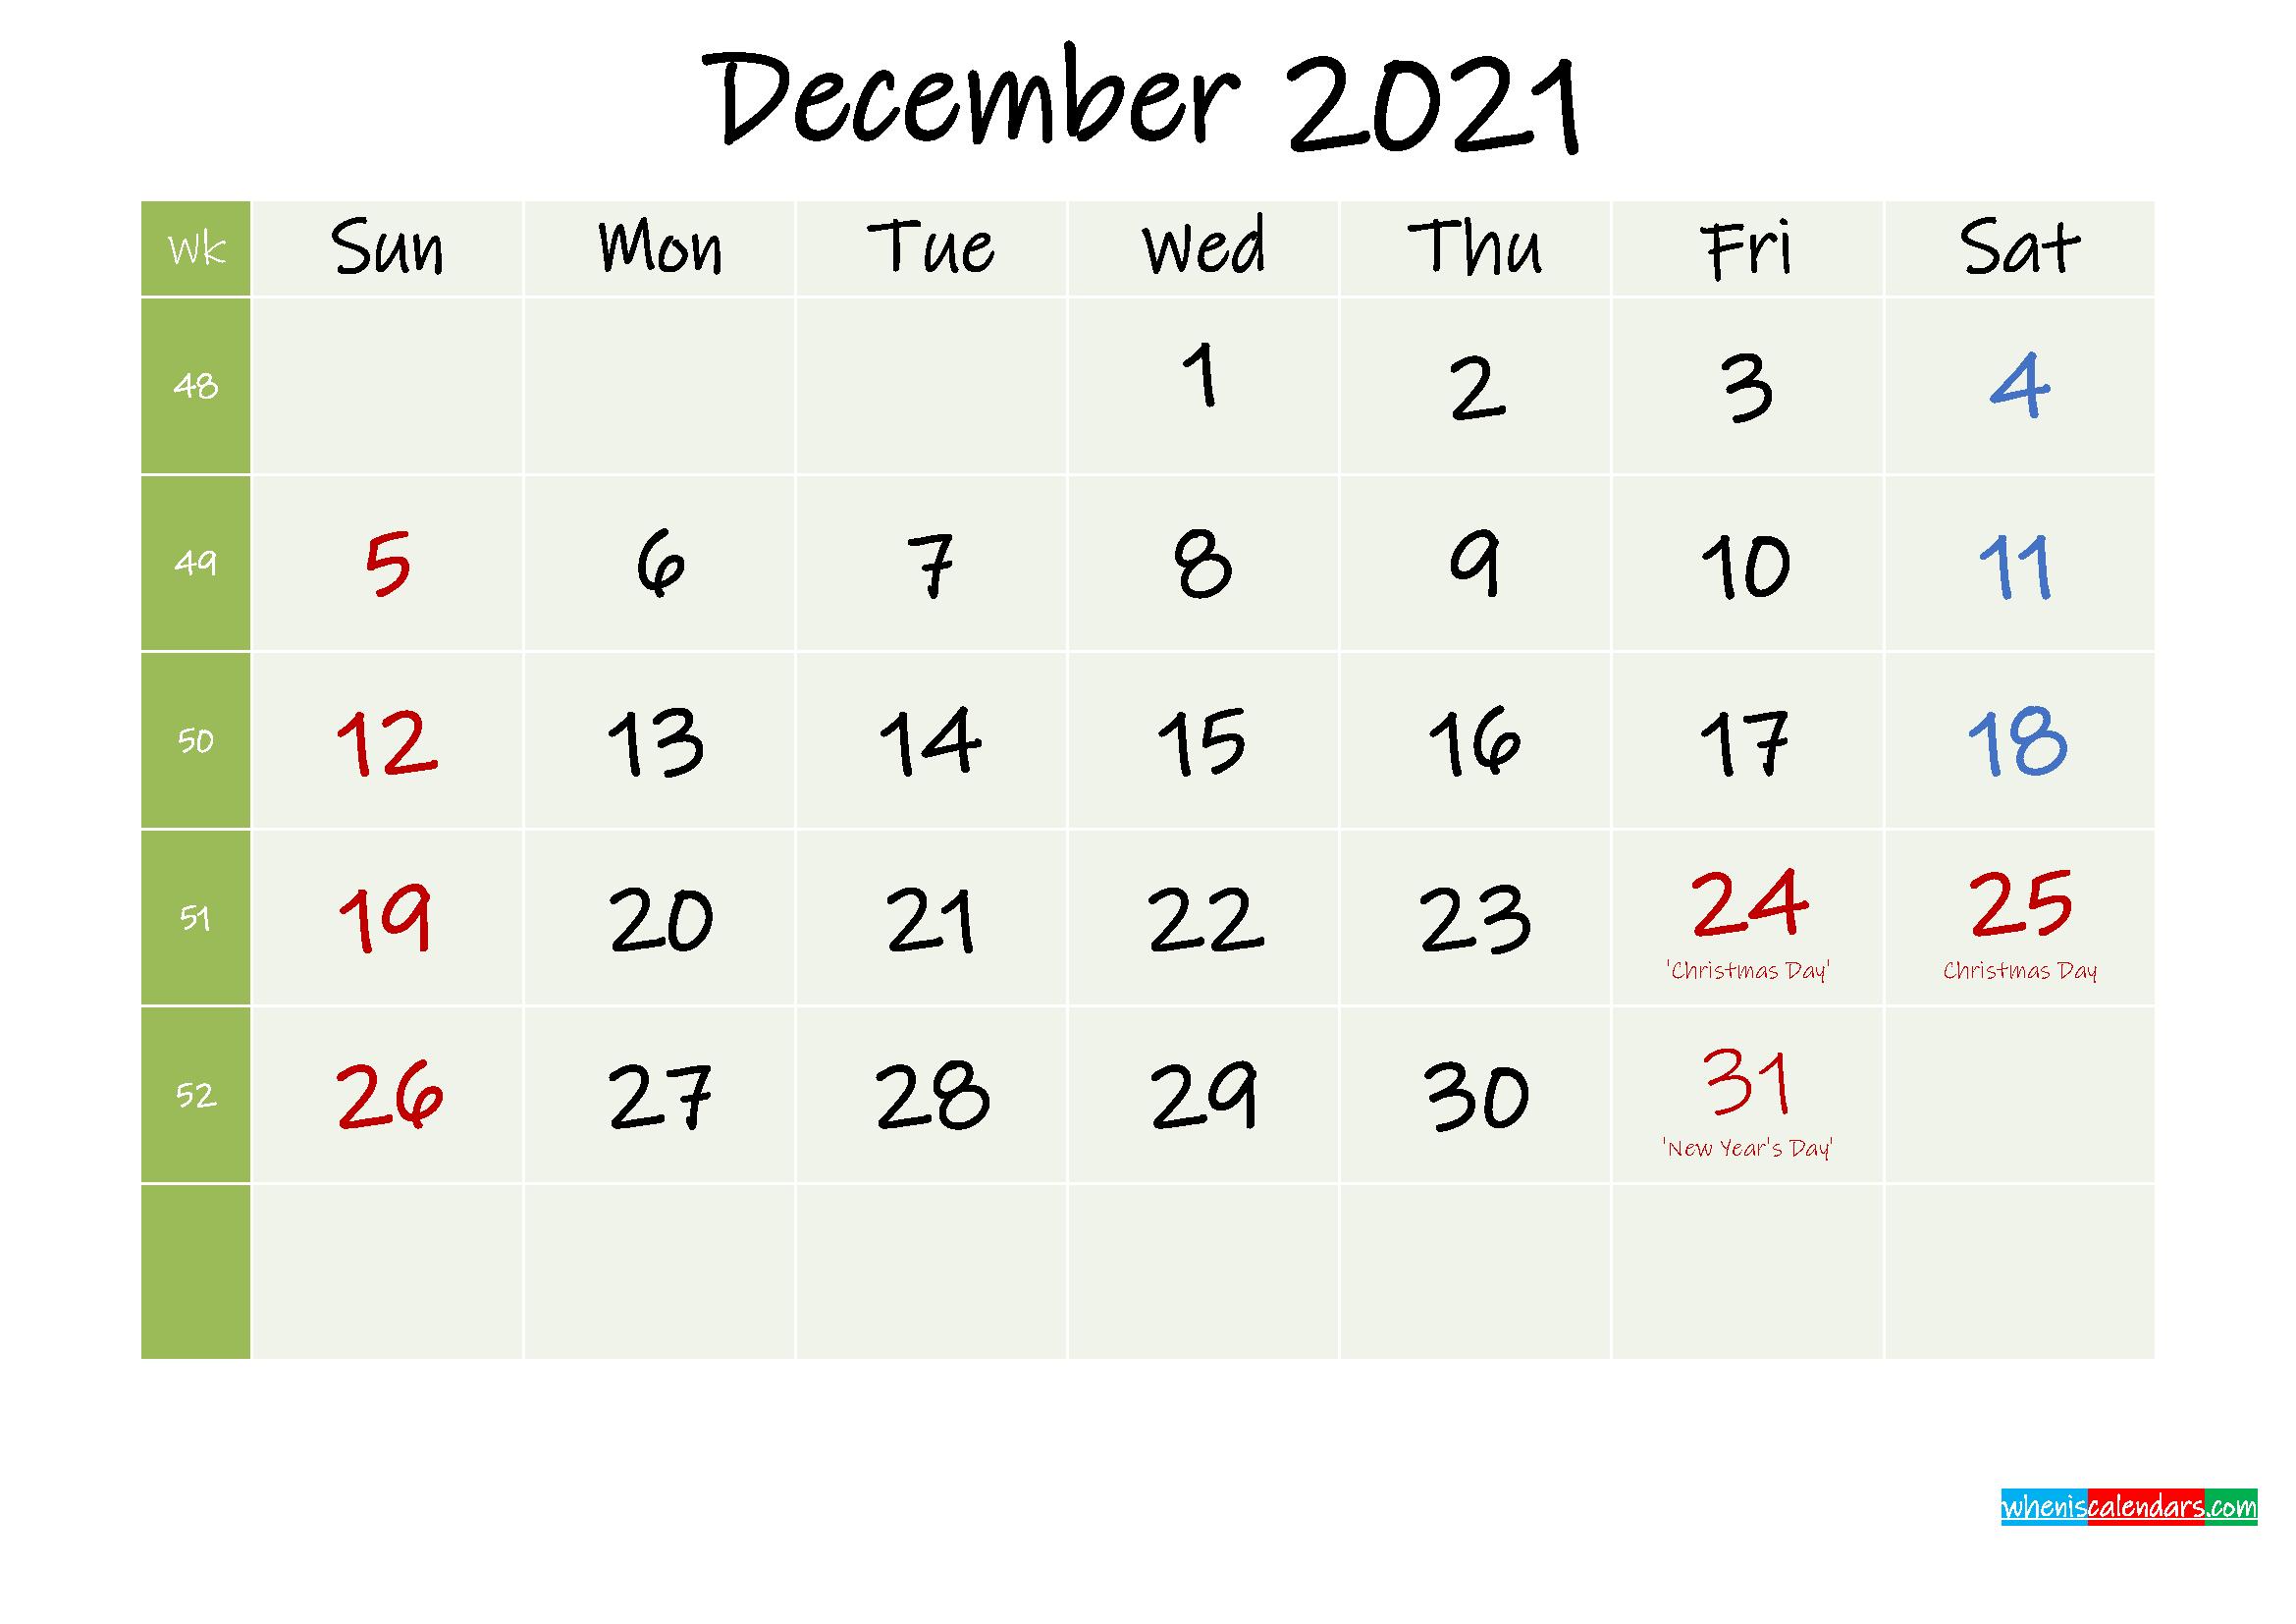 Free Printable December 2021 Calendar With Holidays